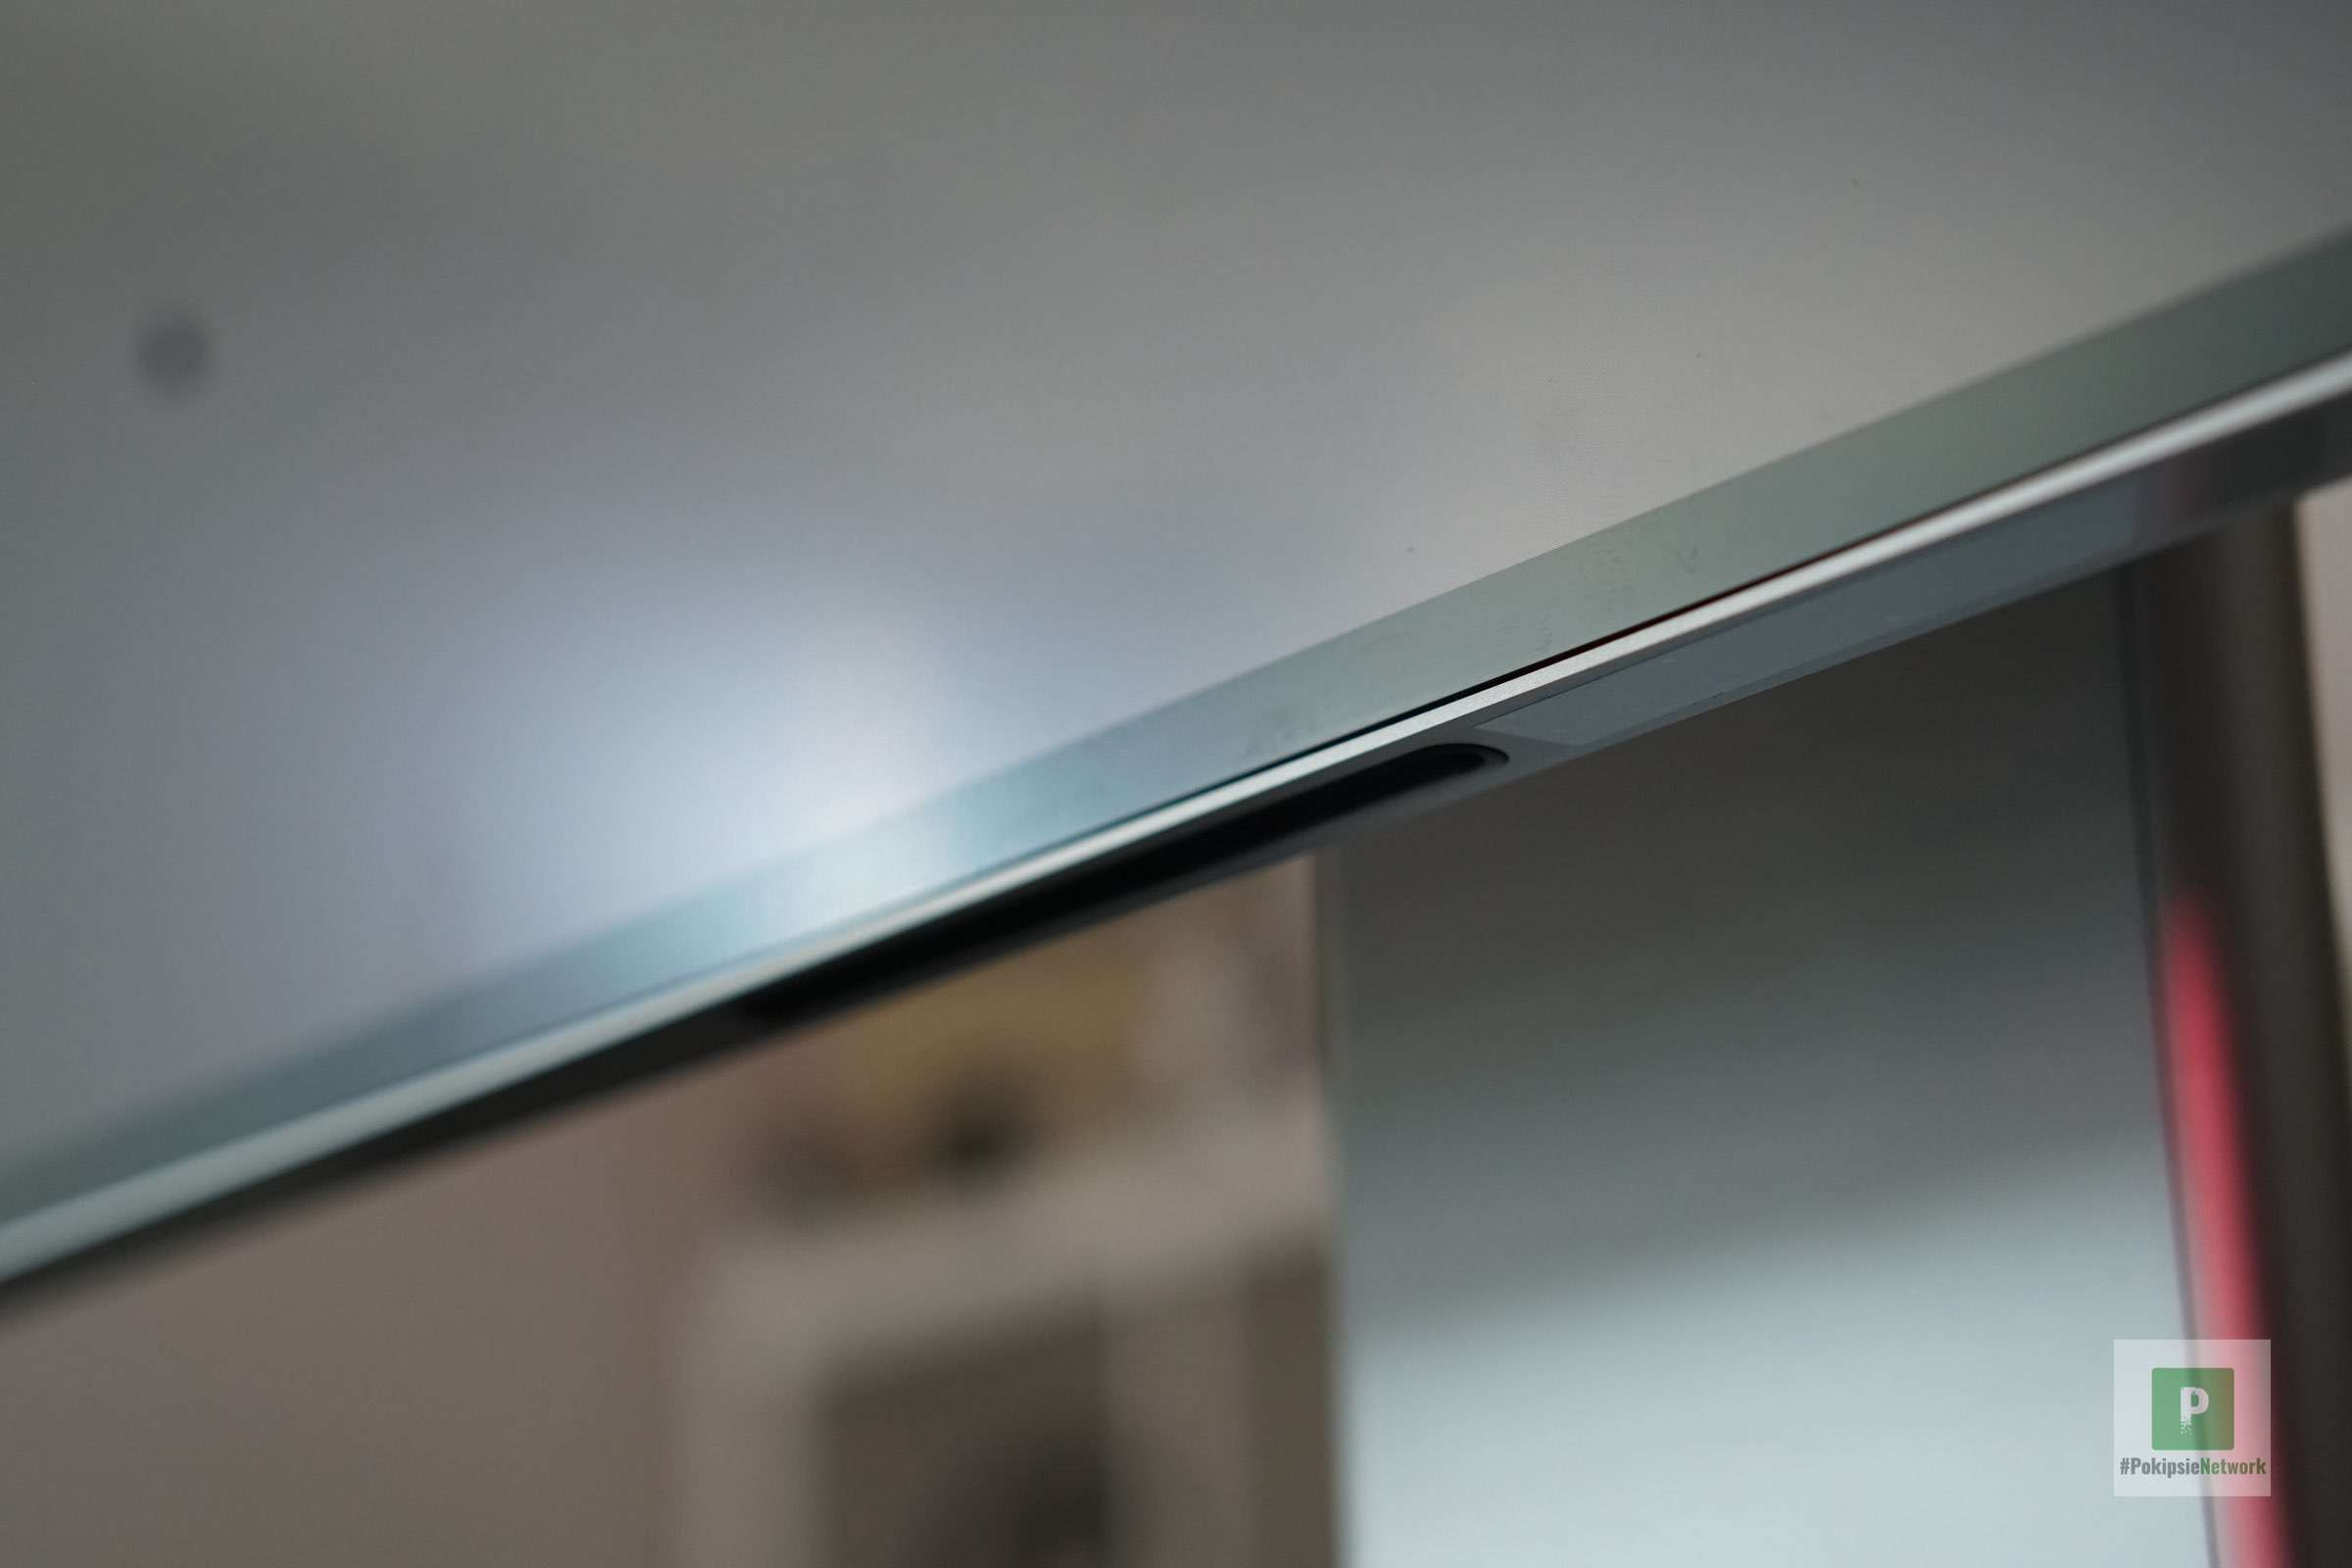 Einfache Touch-Bedienung (Huawei Smart Bar)